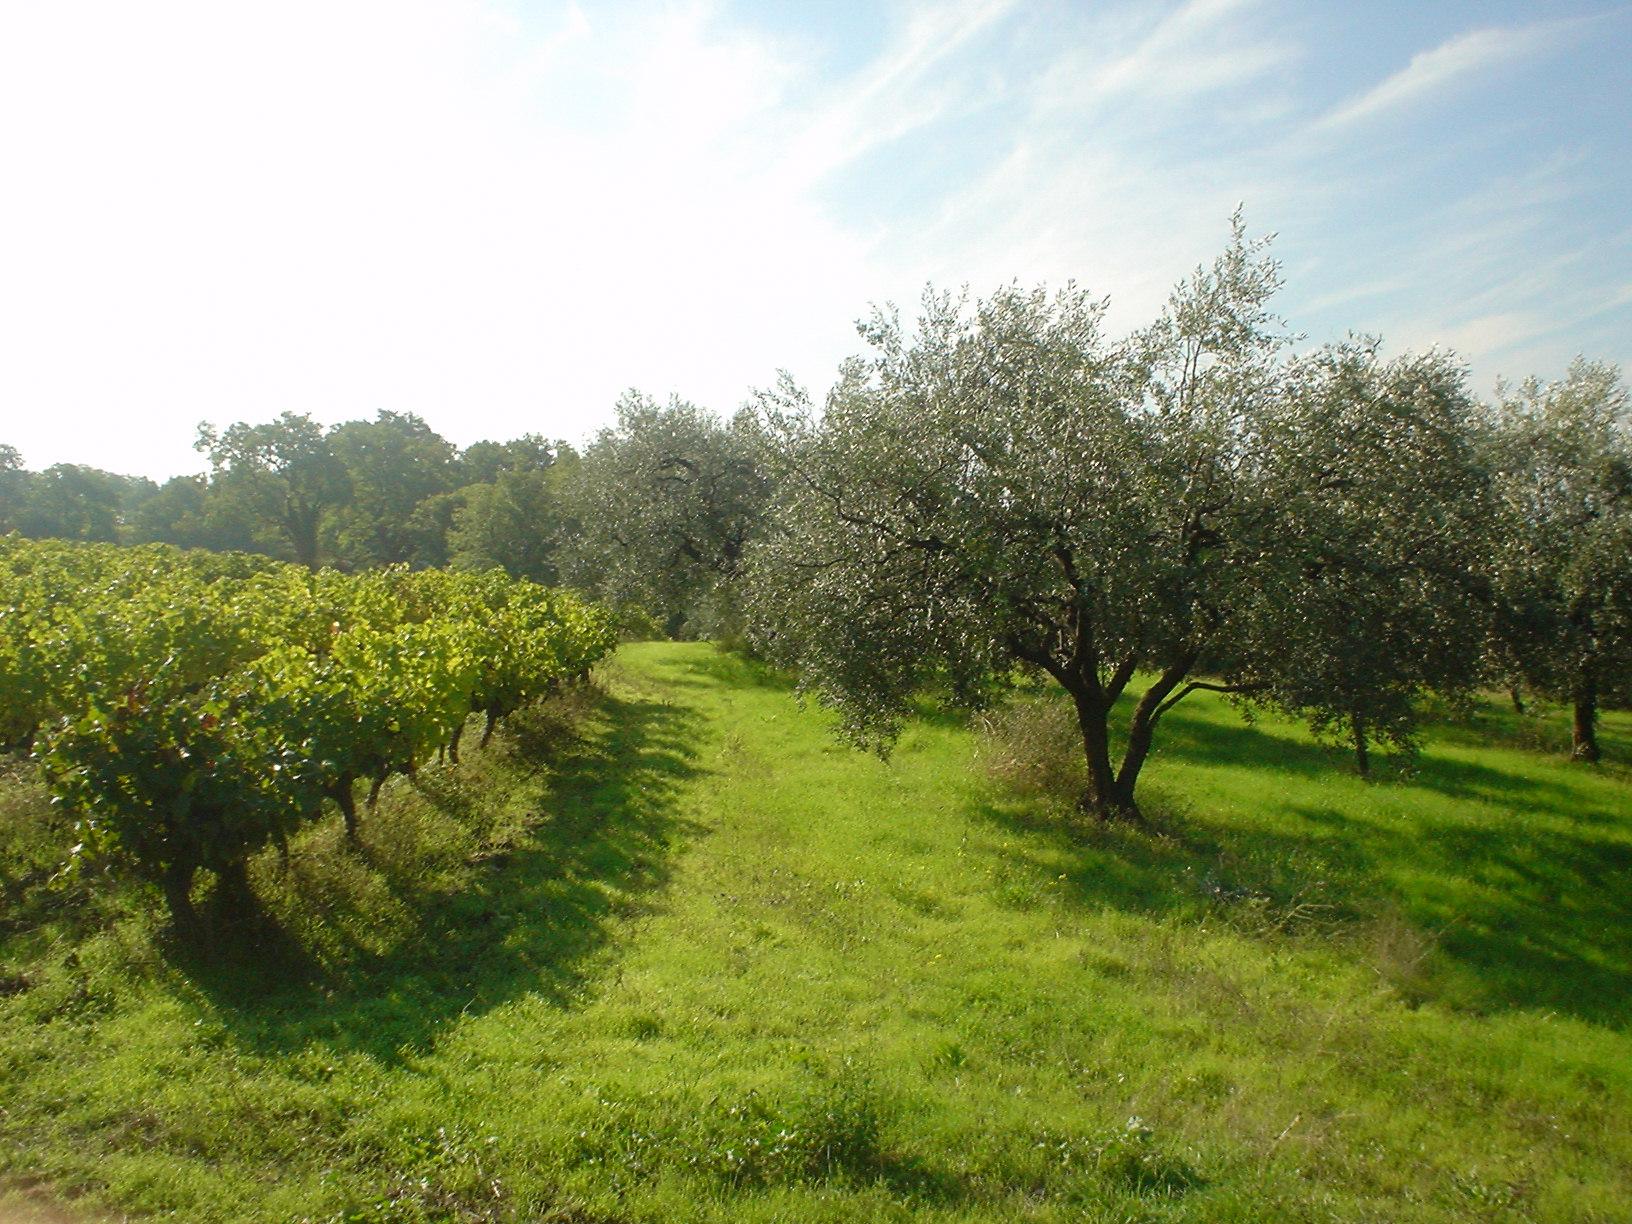 Domaine du ch ne vert site de domaineduchenevert - Maladie du chene vert arbre ...